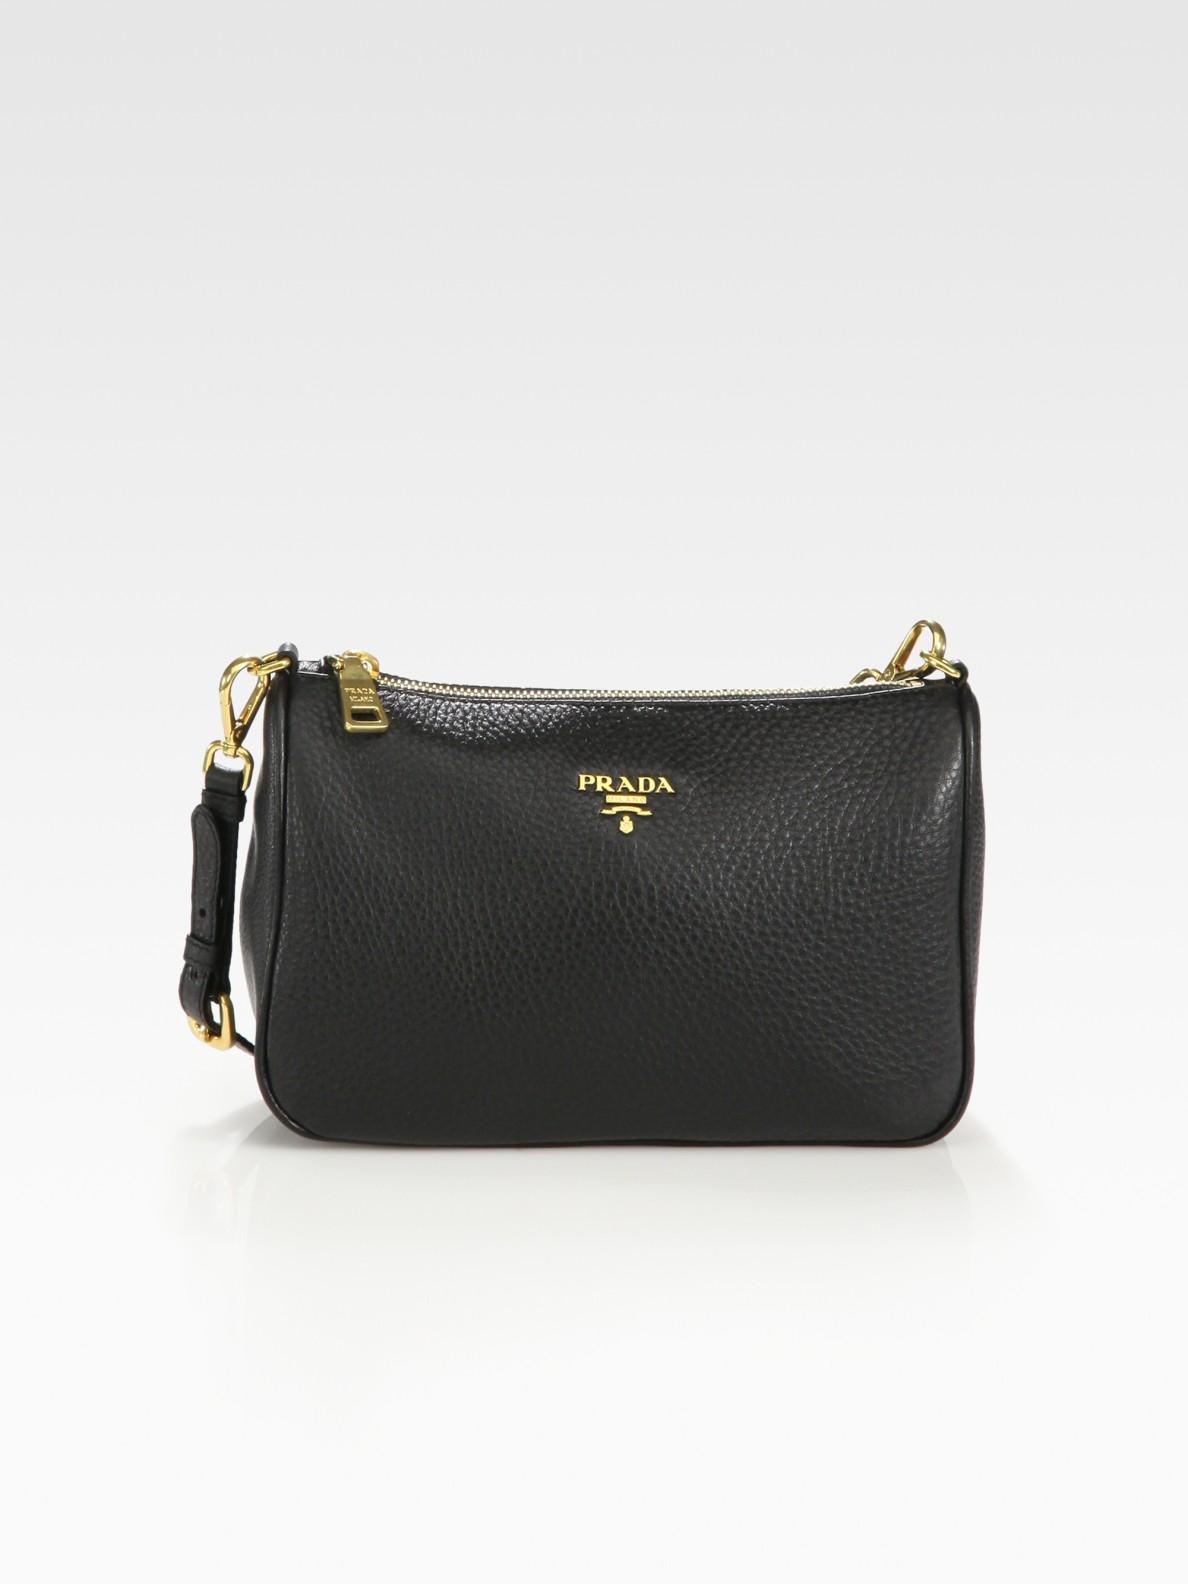 c758dd42cecd ... sale lyst prada daino mini hobo bag in black 0c45b 3575d